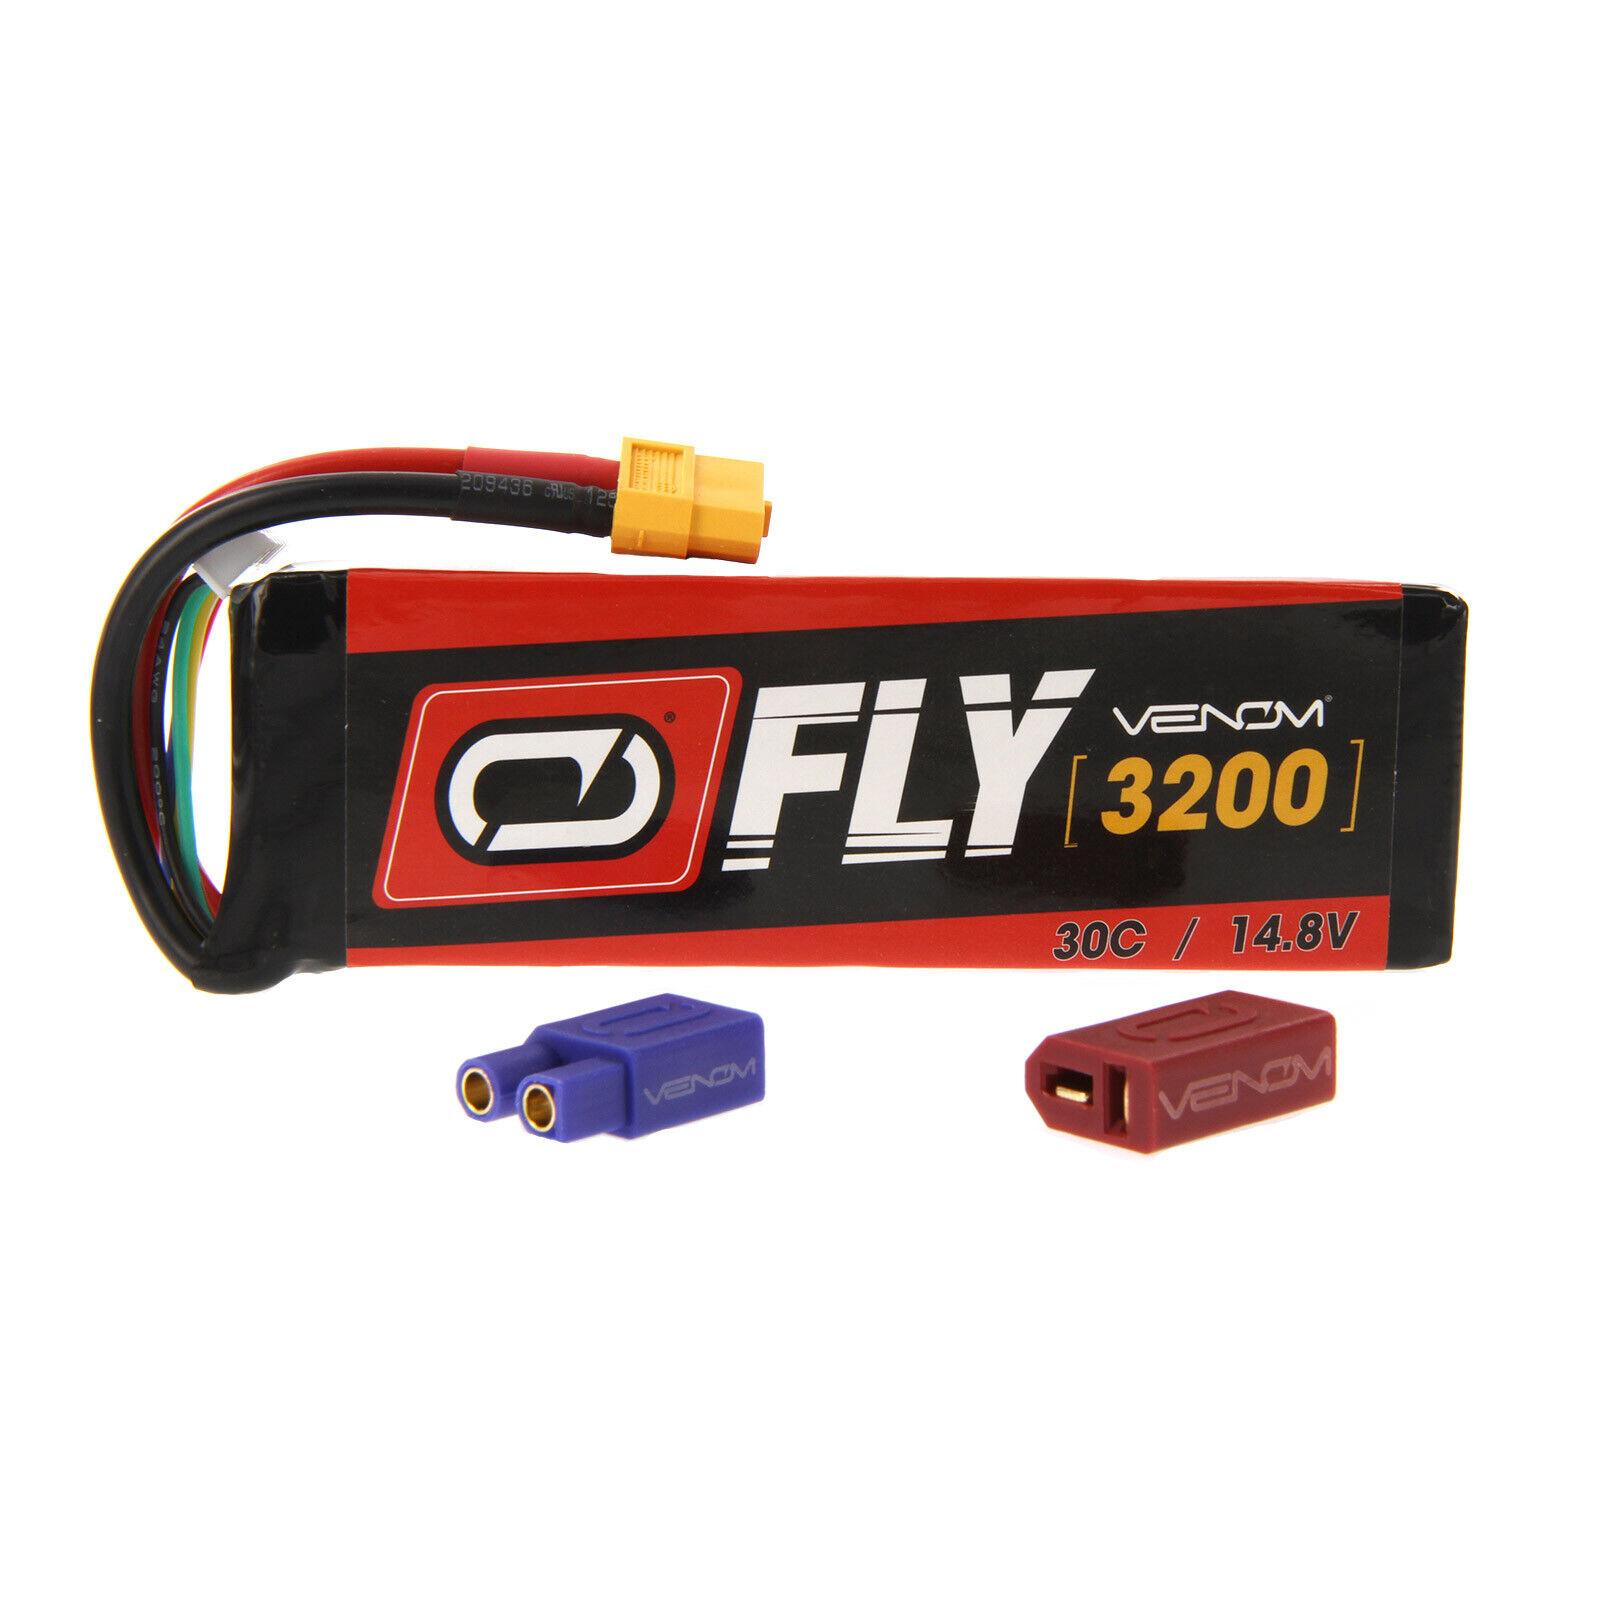 Hangar 9 Alfa 40 30C 4S 3200mAh 14.8V Batería Lipo Con Enchufe Uni 2.0 por Venom